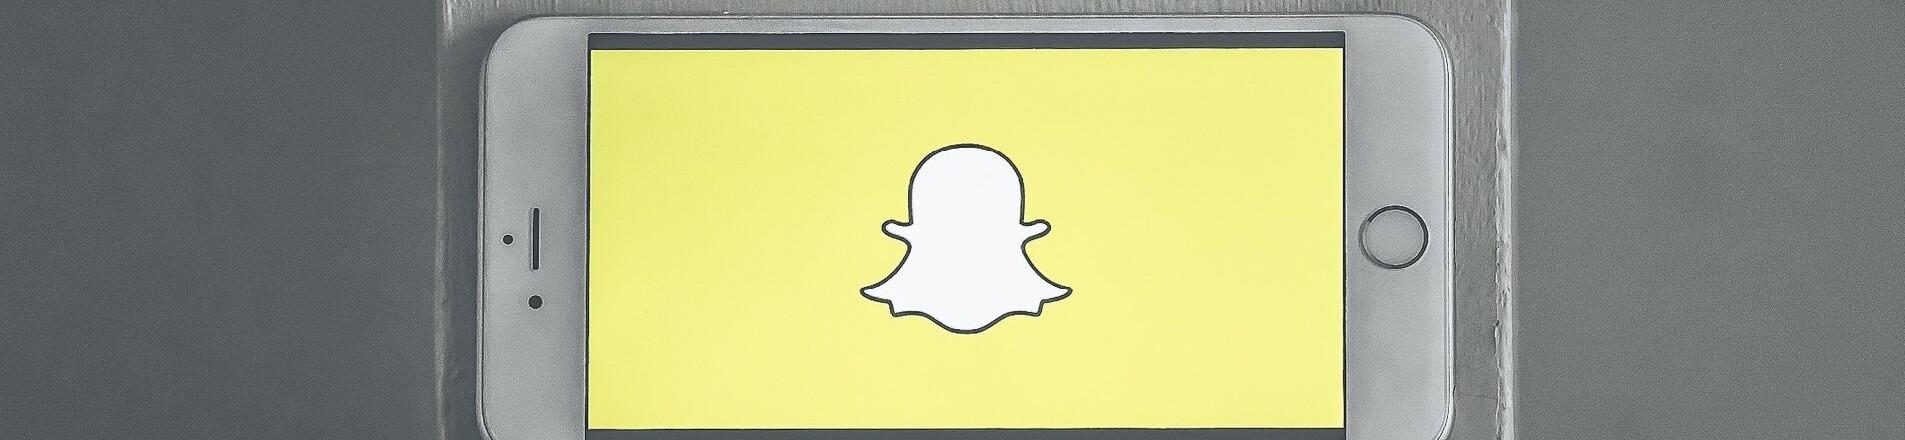 Atkins piloting Snapchat!